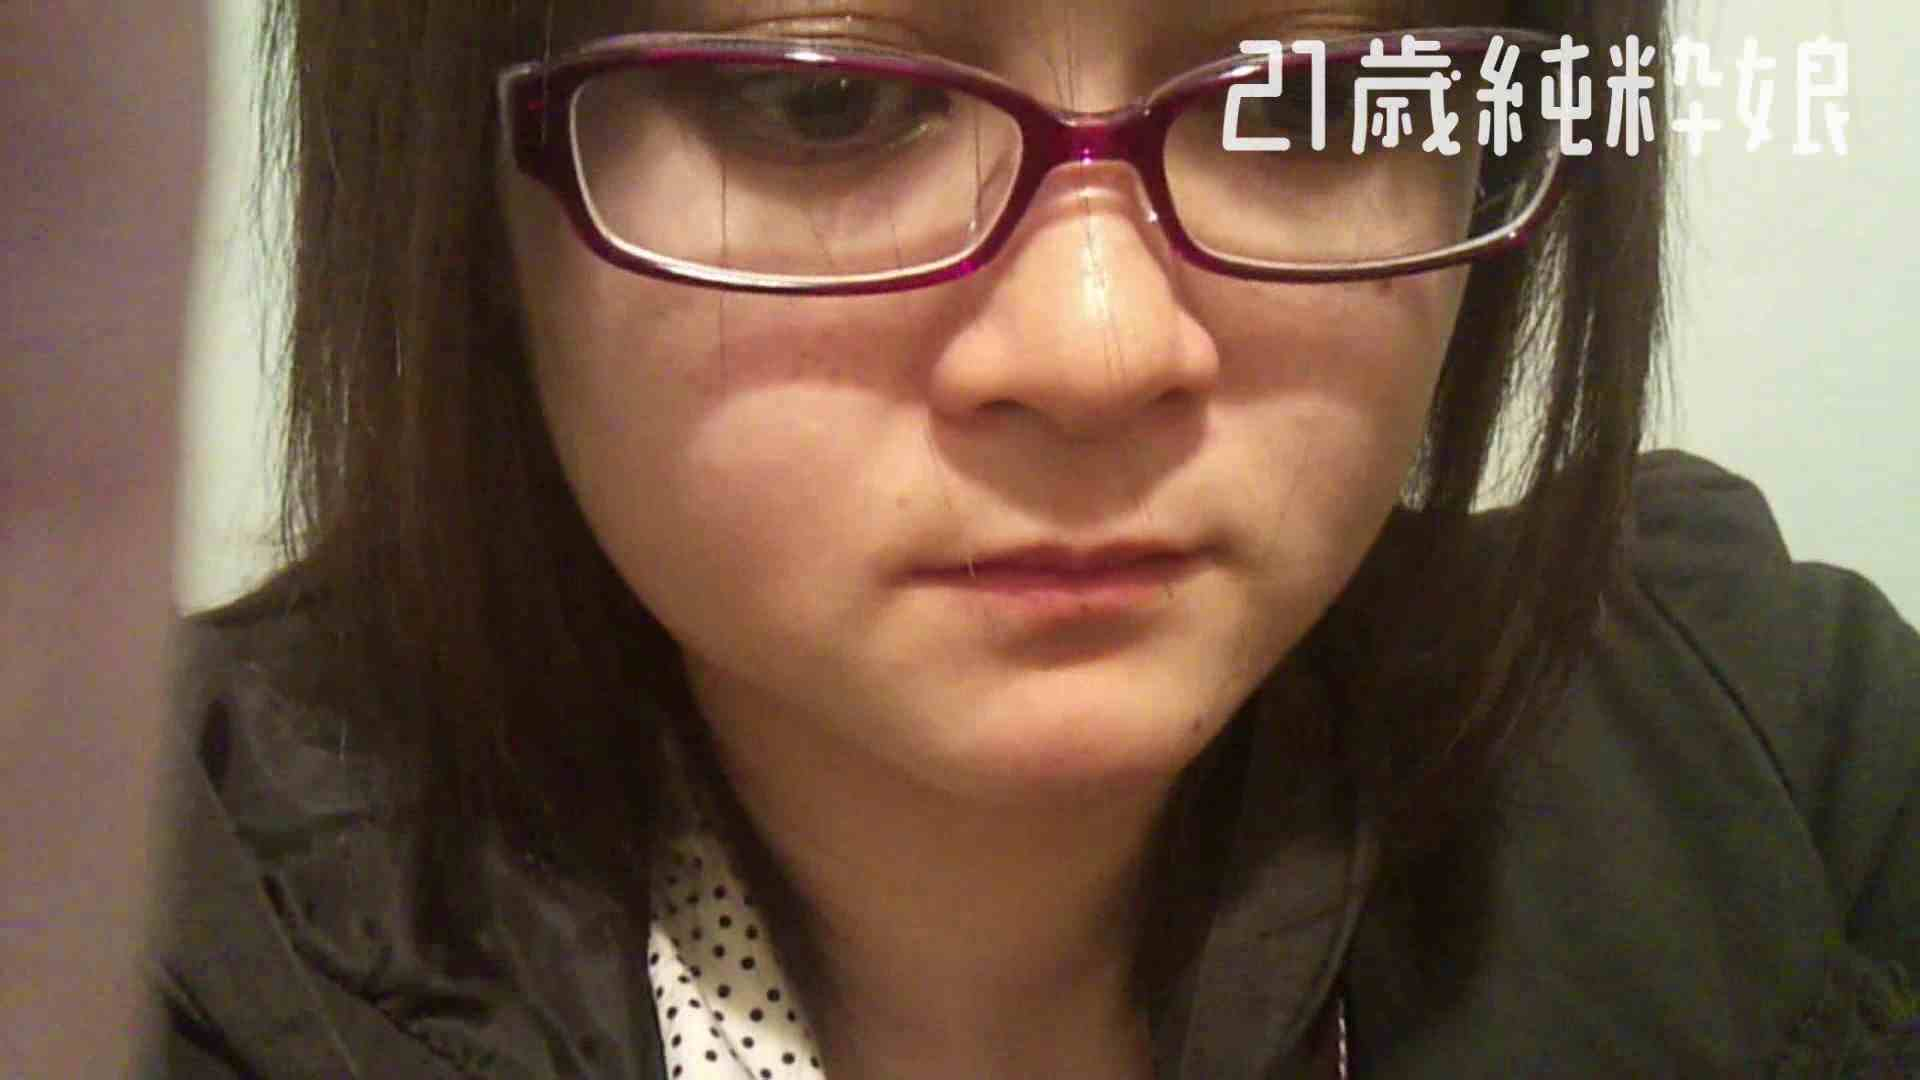 Gカップ21歳純粋嬢第2弾Vol.5 美女OL  78連発 68